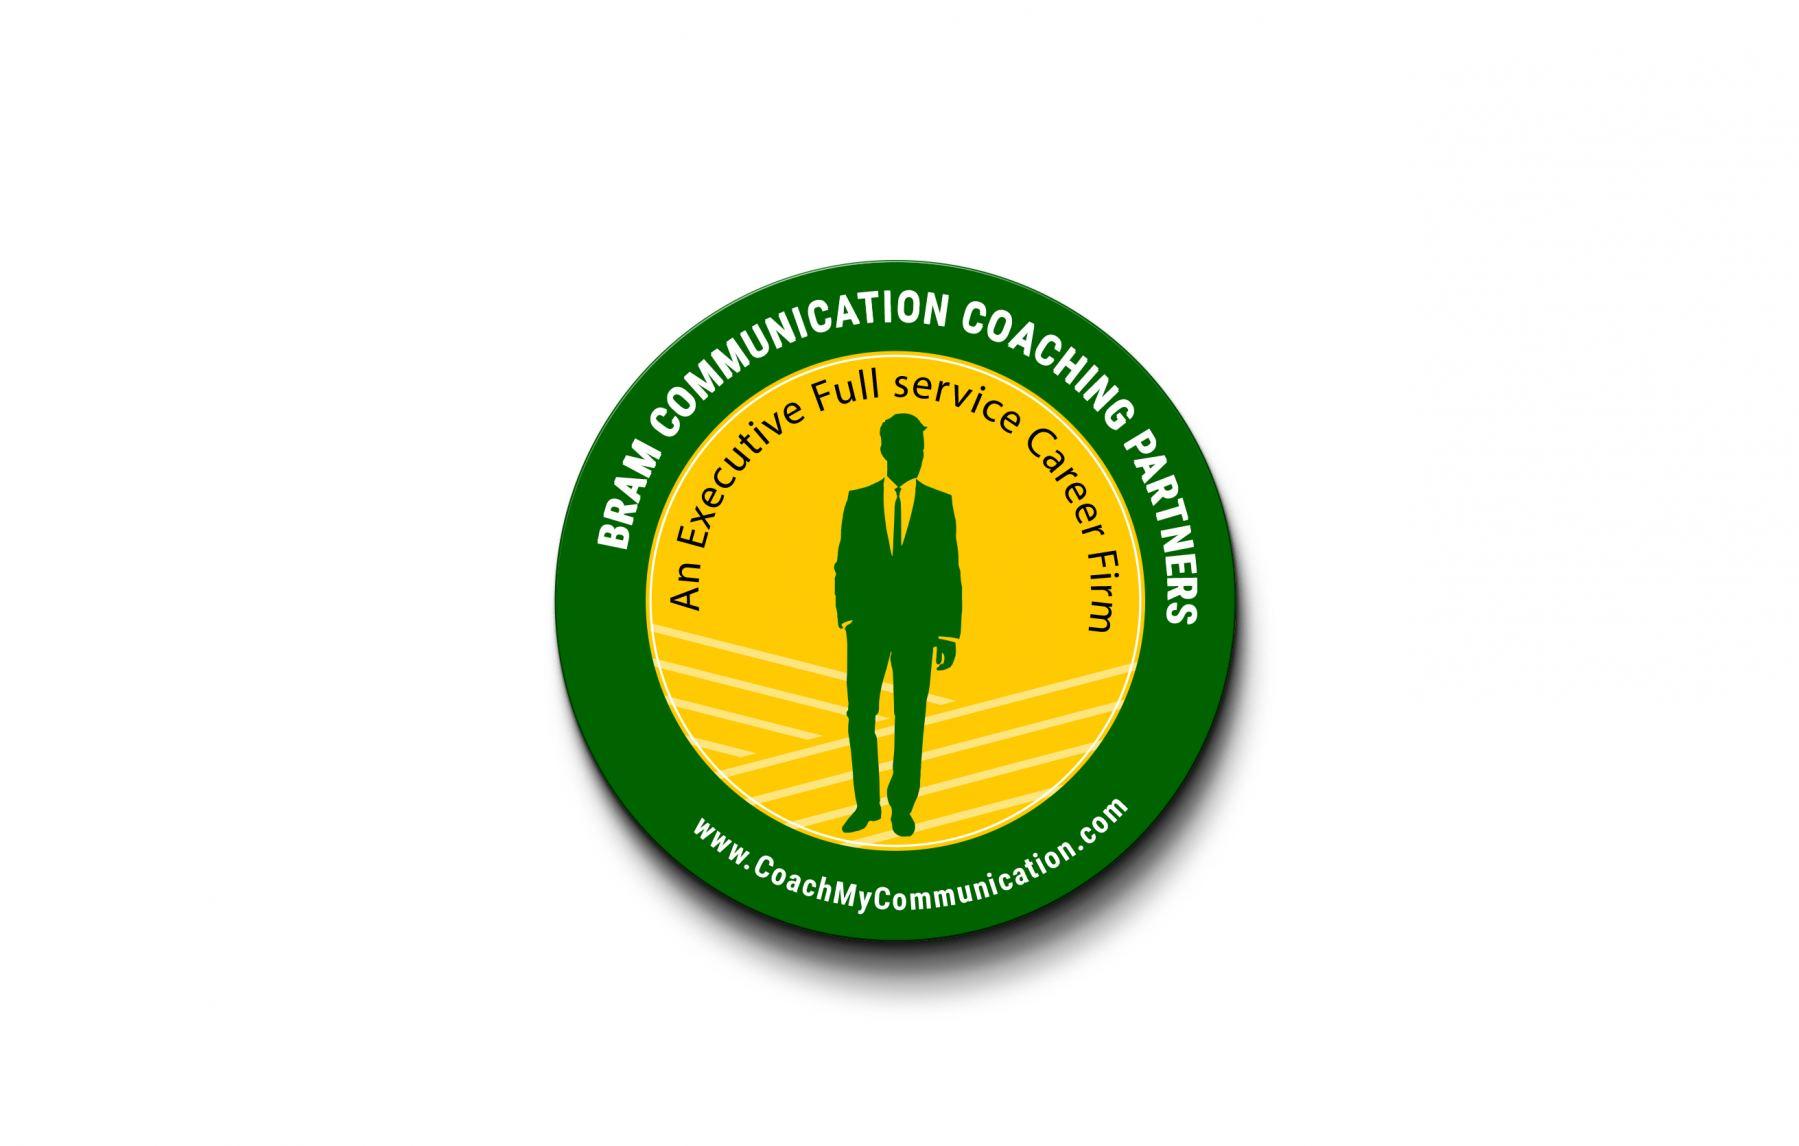 Bram Communication Consulting Partners Logo